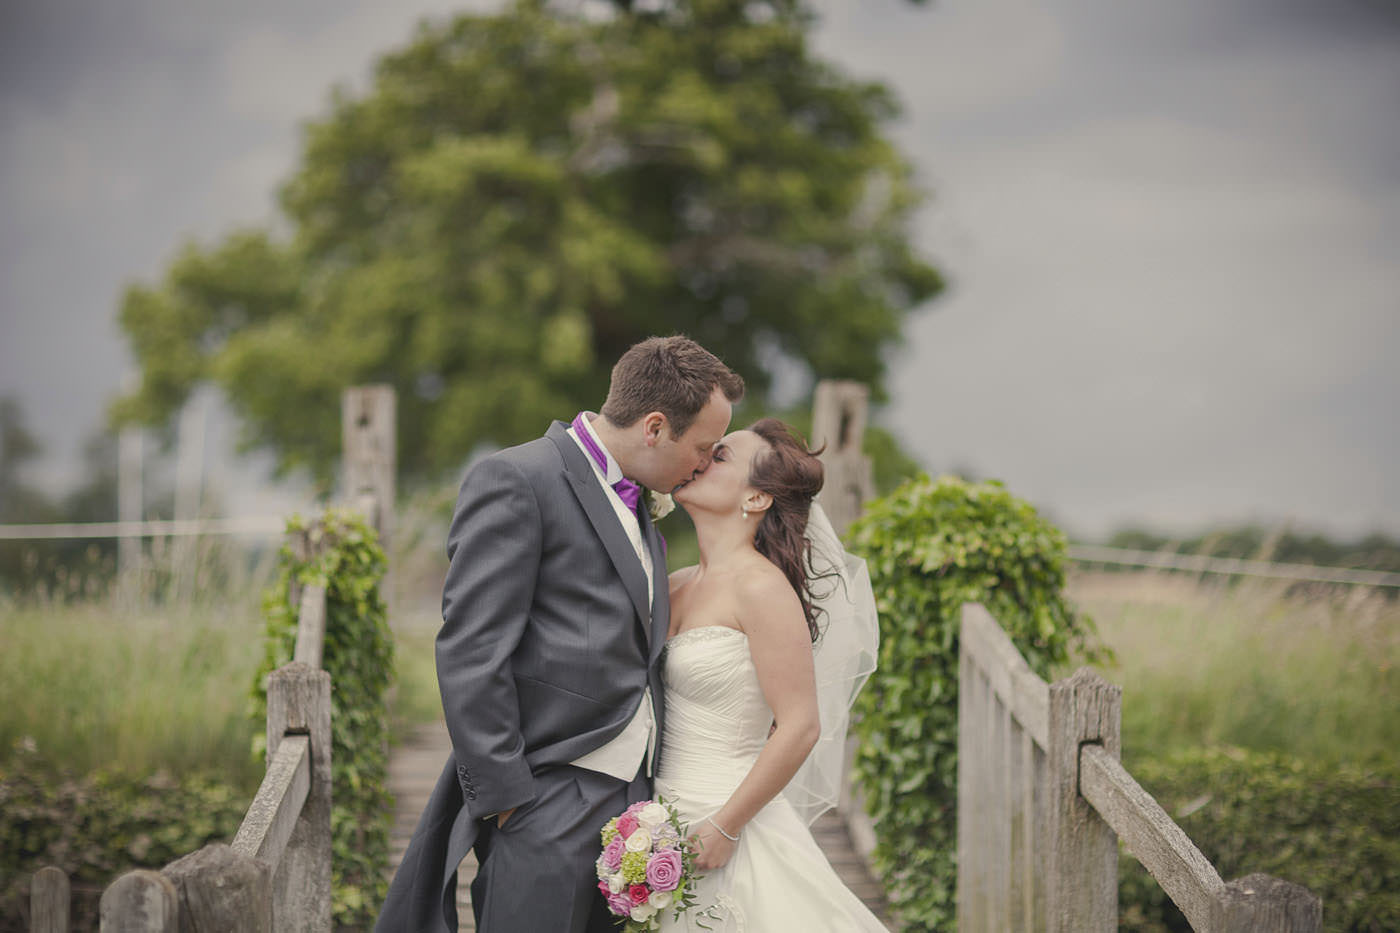 chrissarah walled garden midhurst wedding photographer 0081